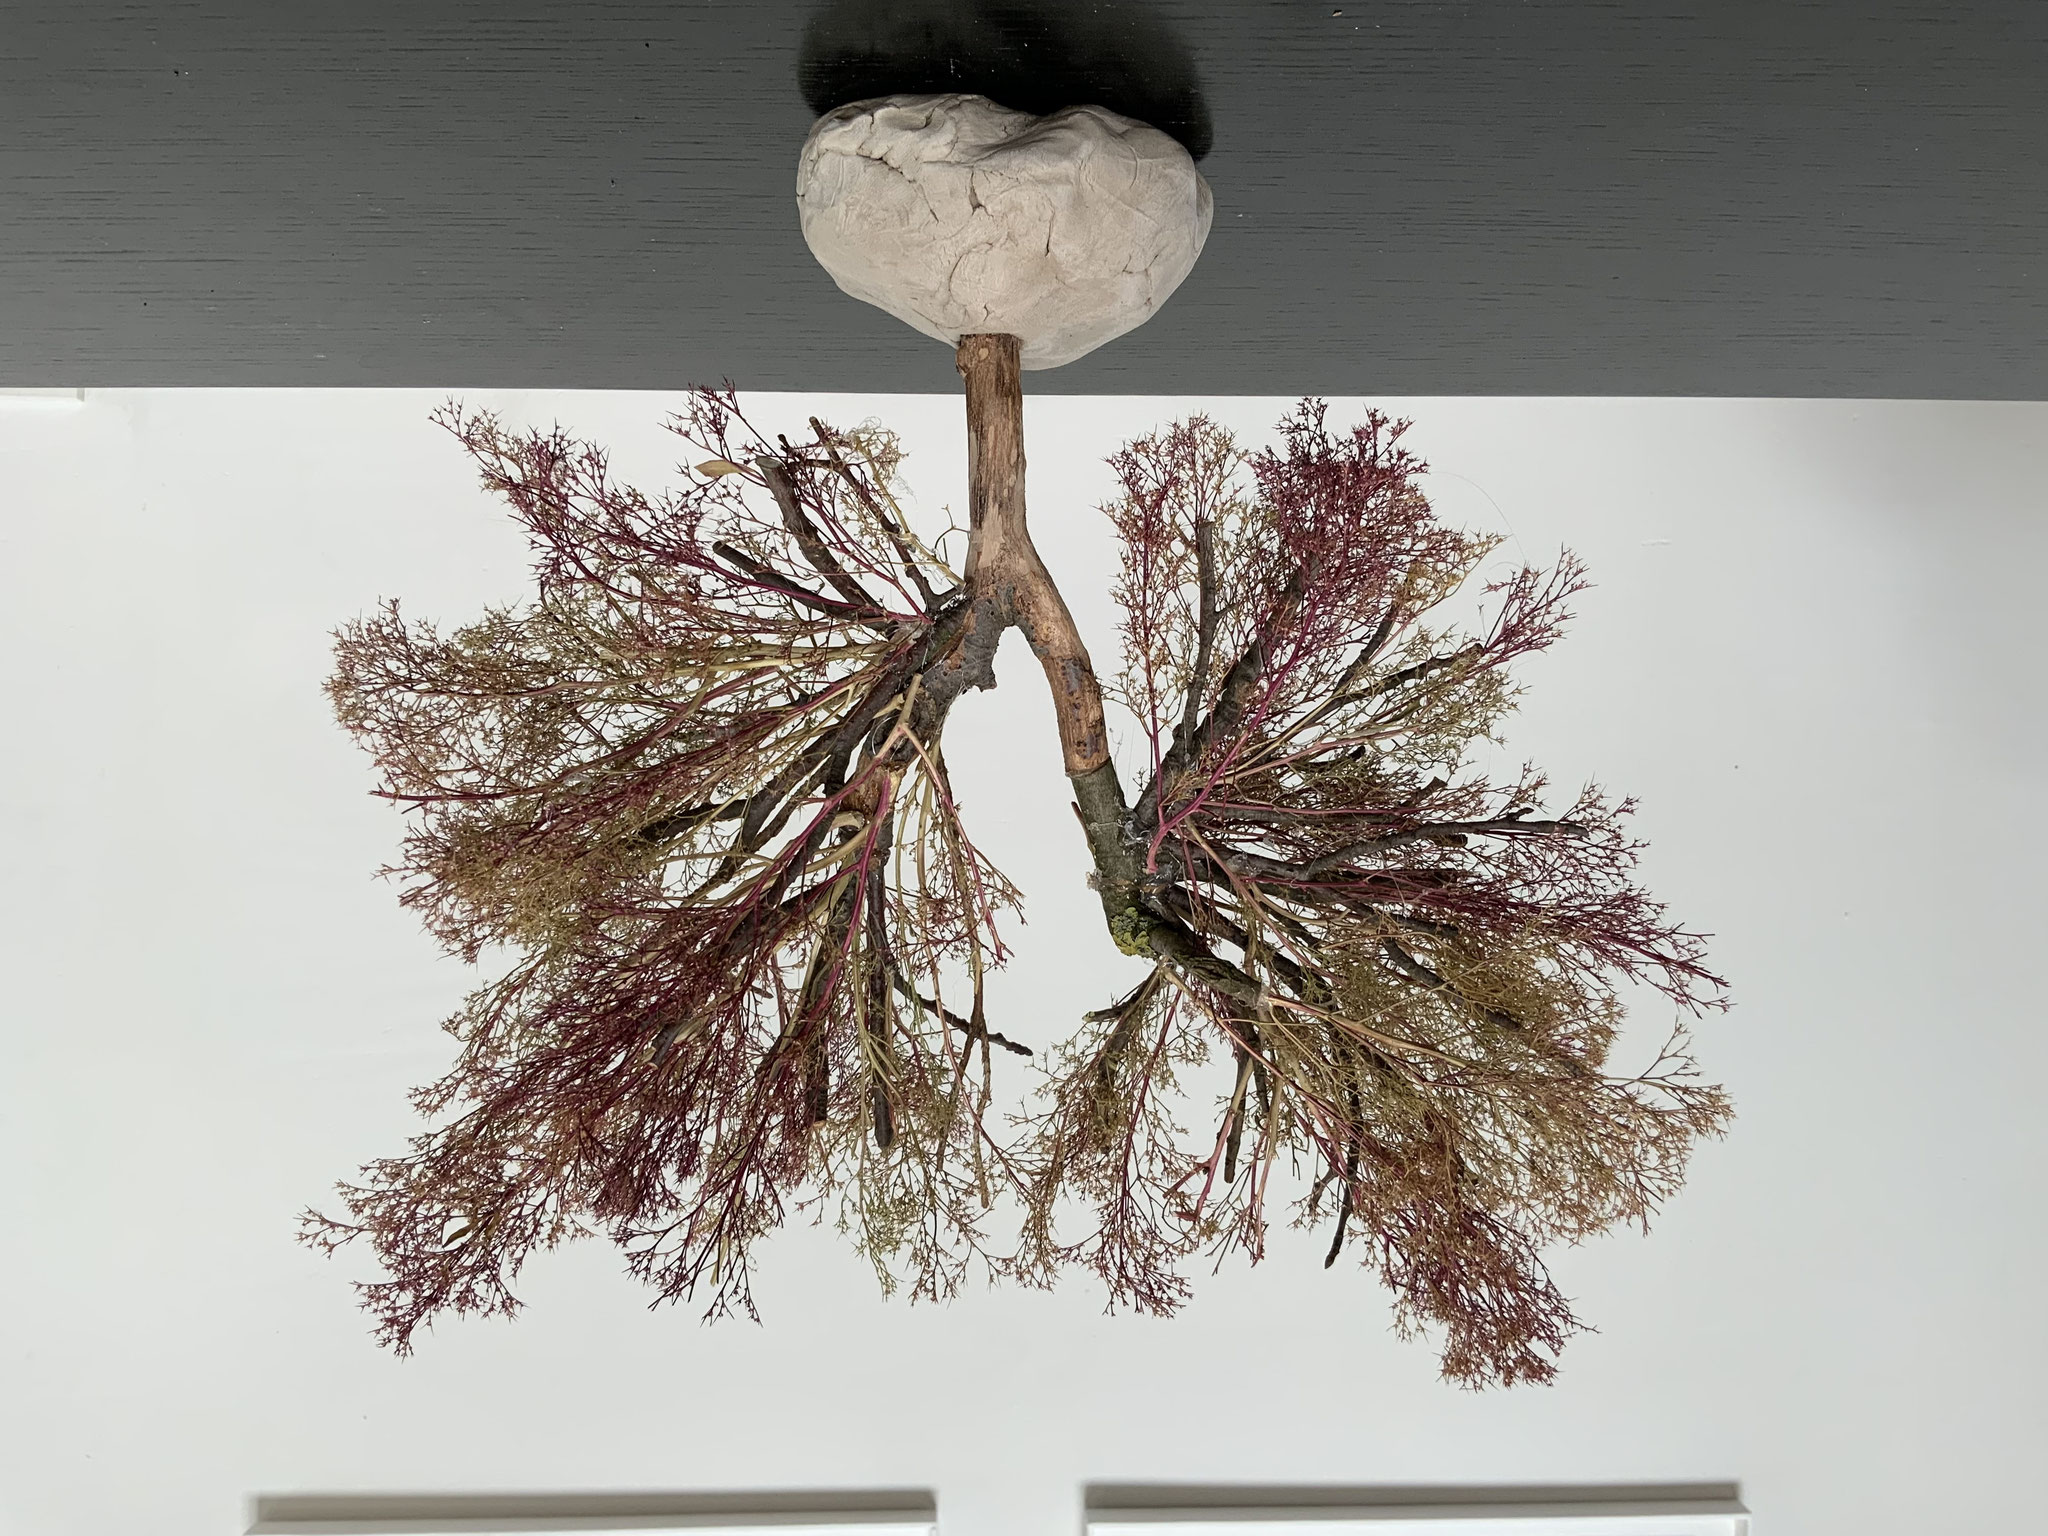 Lungenbaum Helene K.